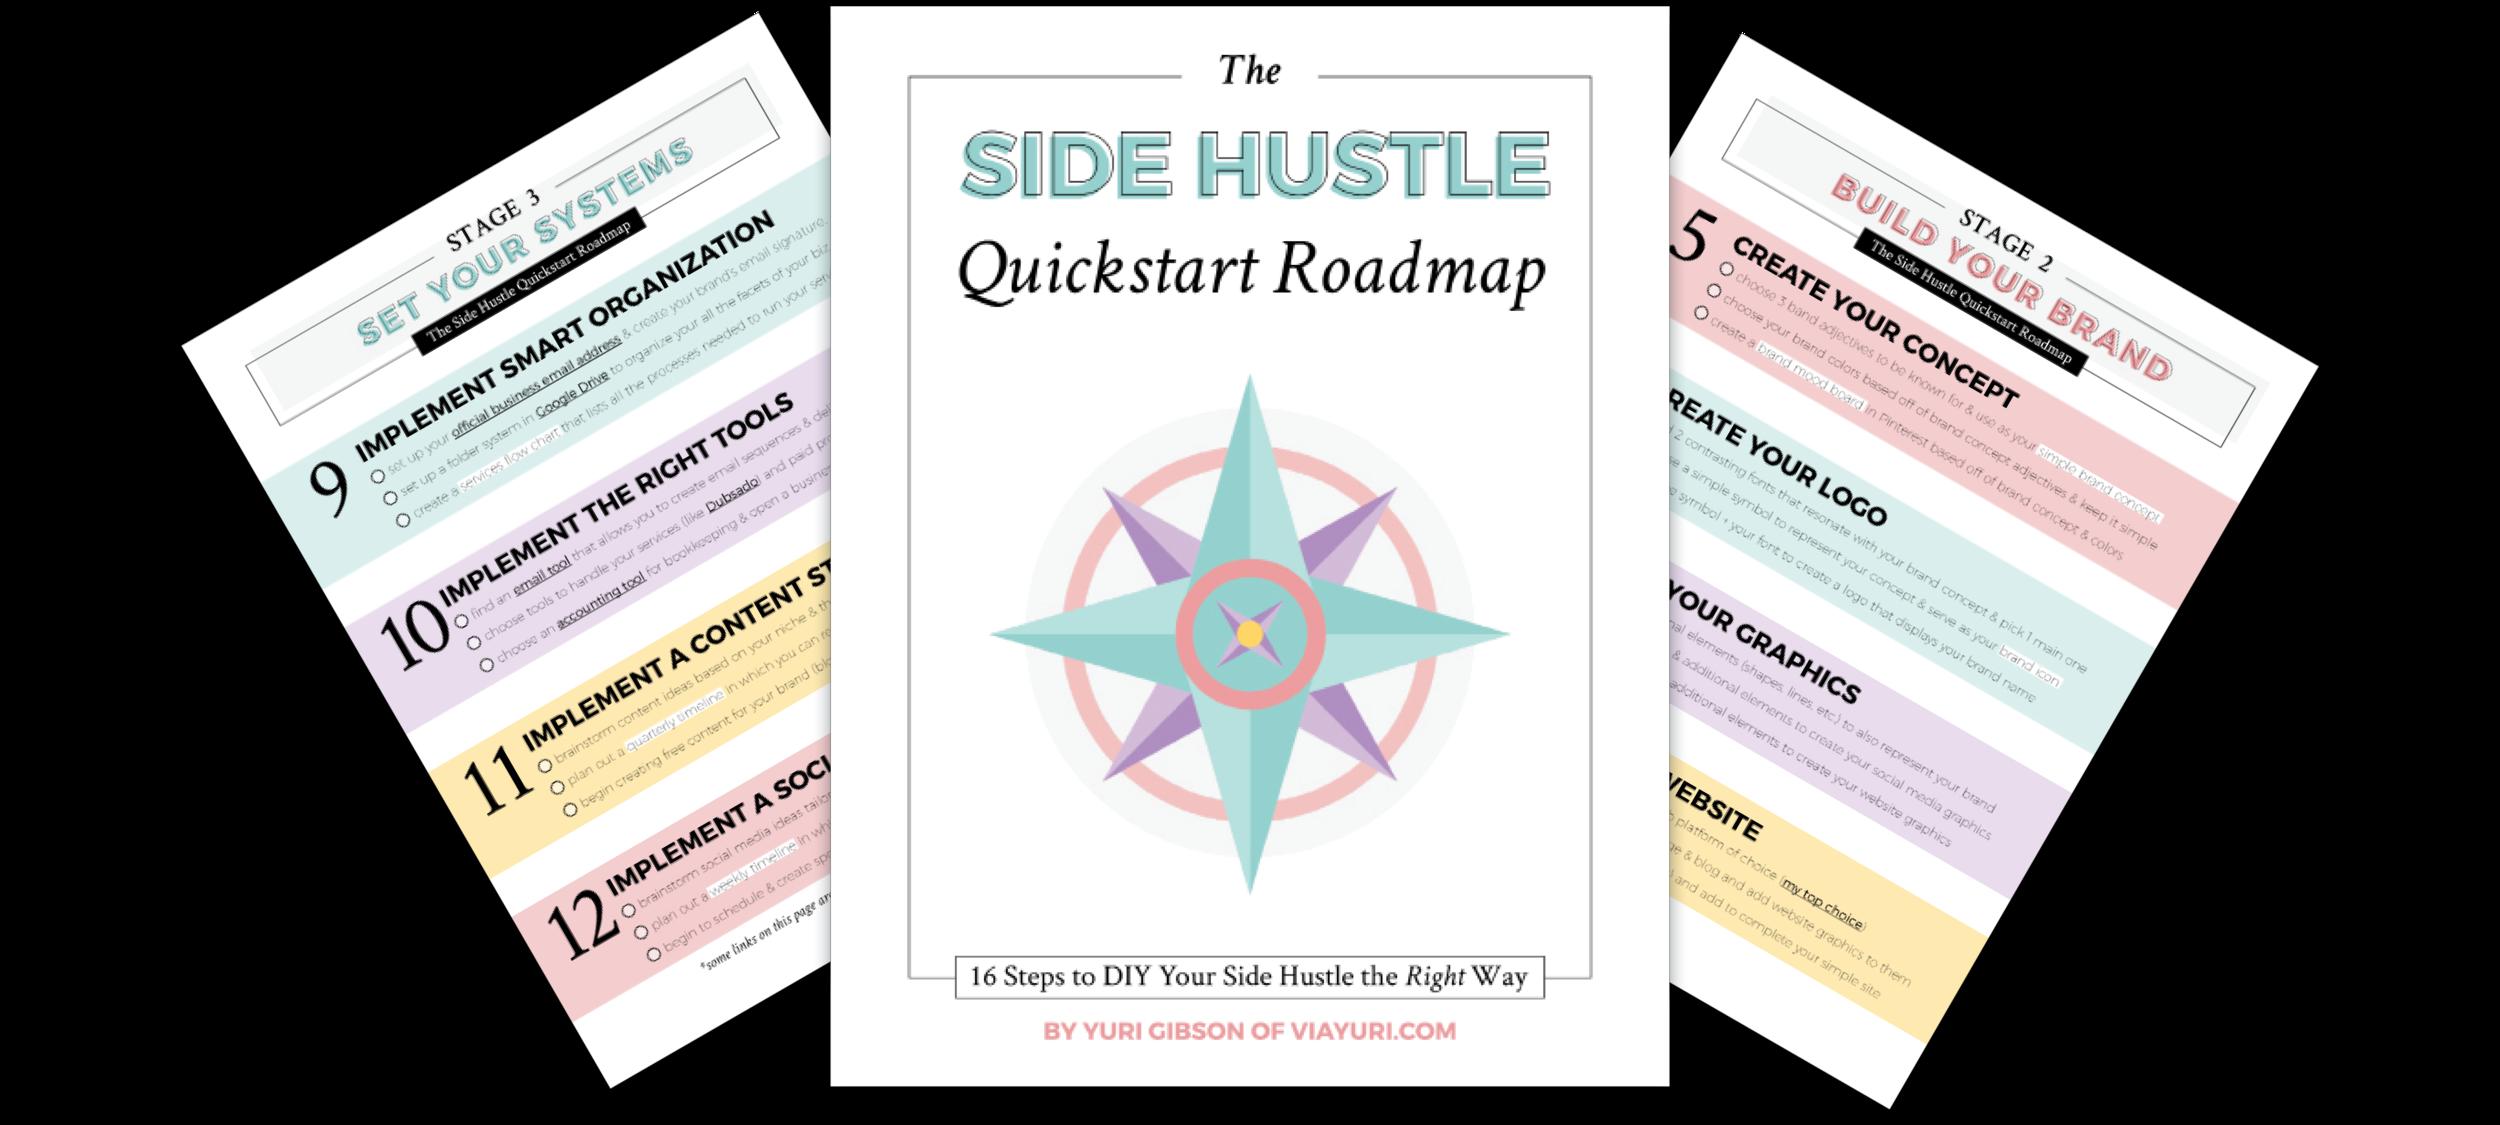 7 Things I Wish I Knew When I Started My Side Hustle, The Side Hustle Quickstart Roadmap   Yuri Gibson of viaYuri.com